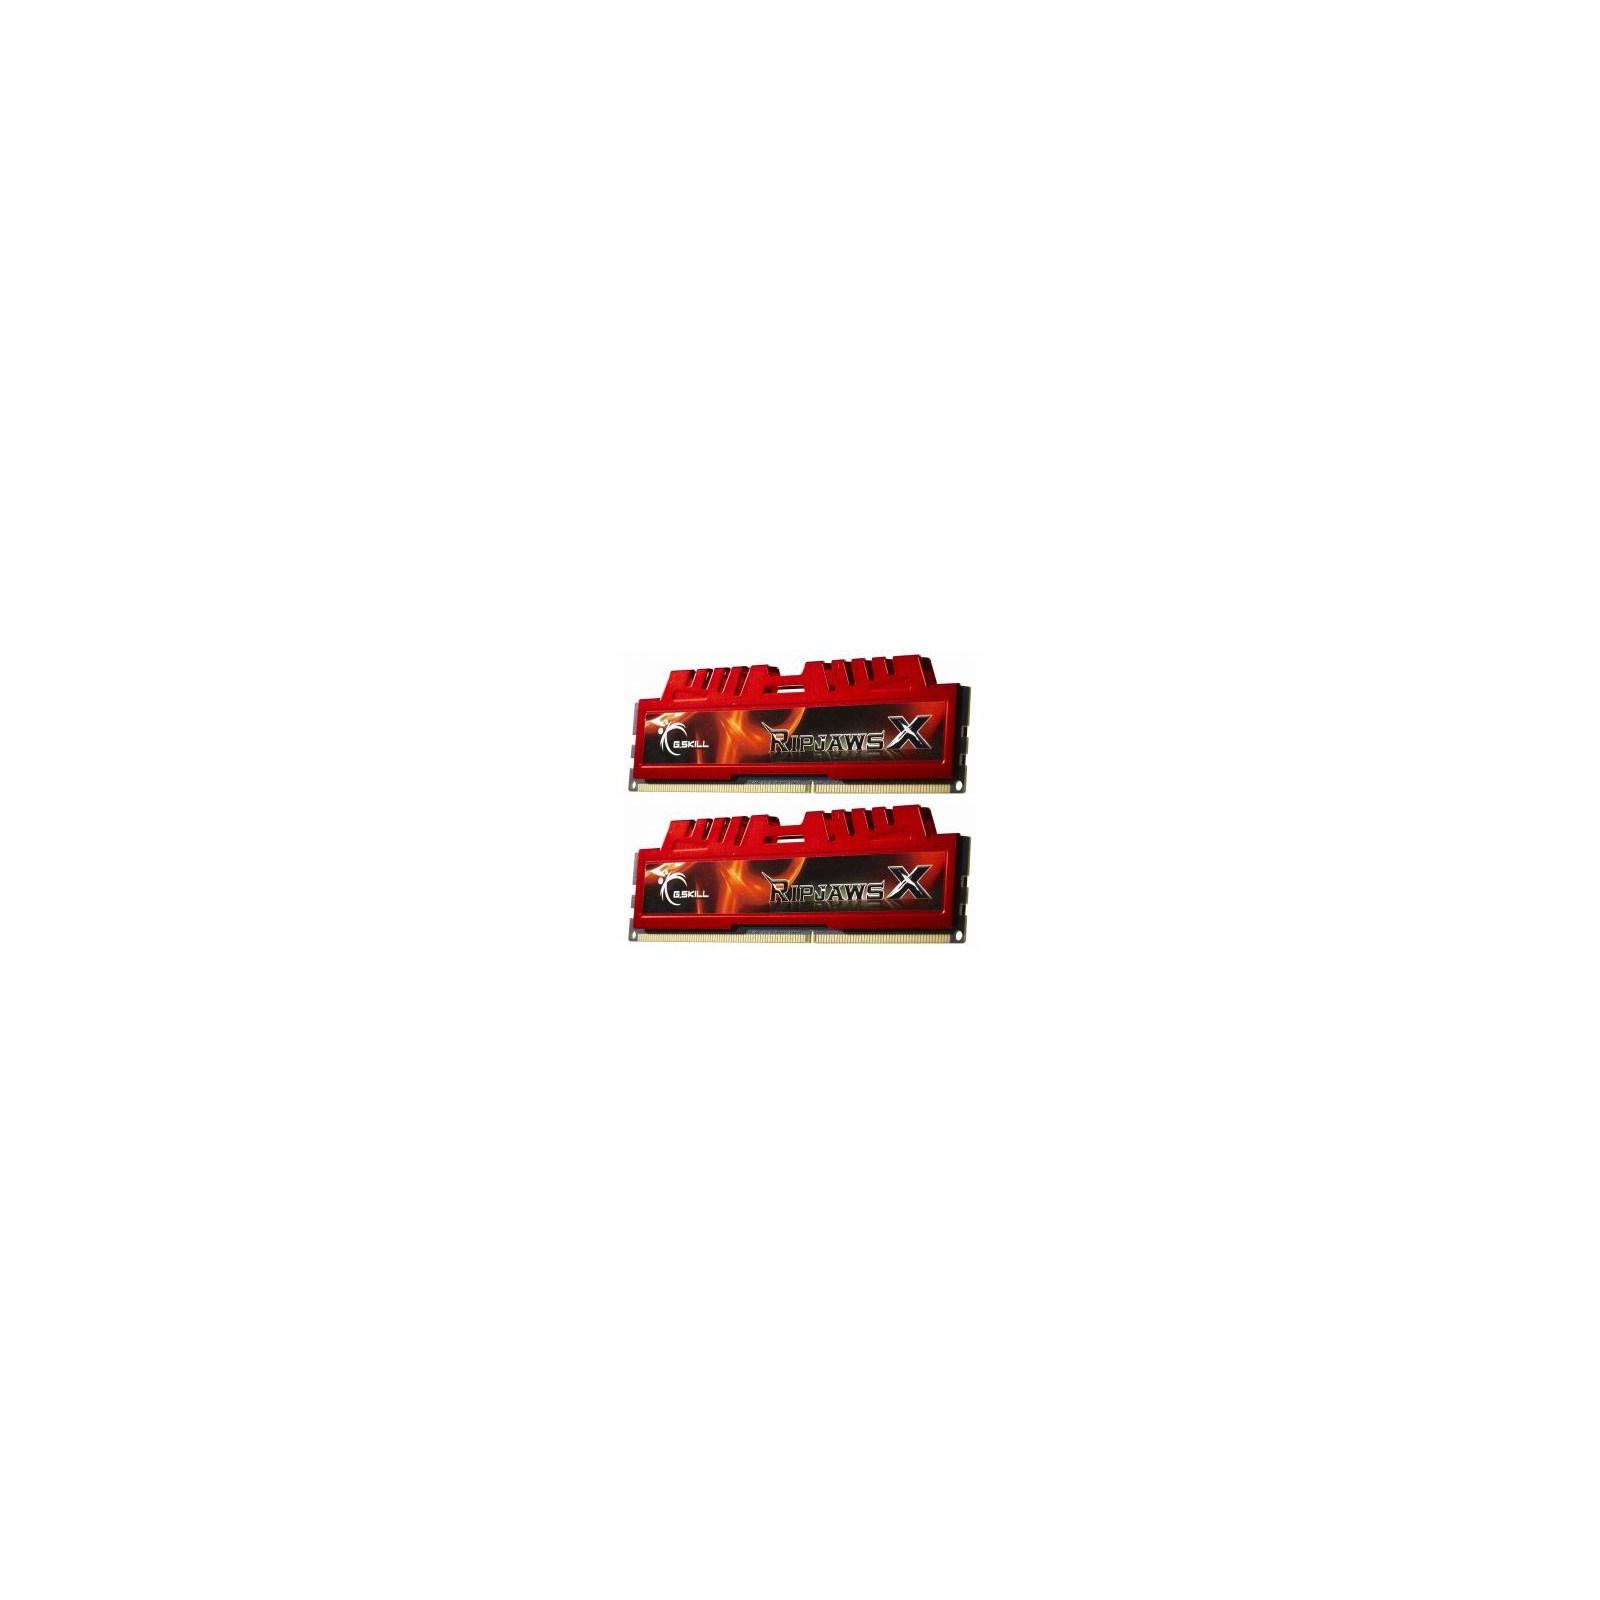 Модуль памяти для компьютера DDR3 4GB (2x2GB) 2133 MHz G.Skill (F3-17000CL9D-4GBXL)